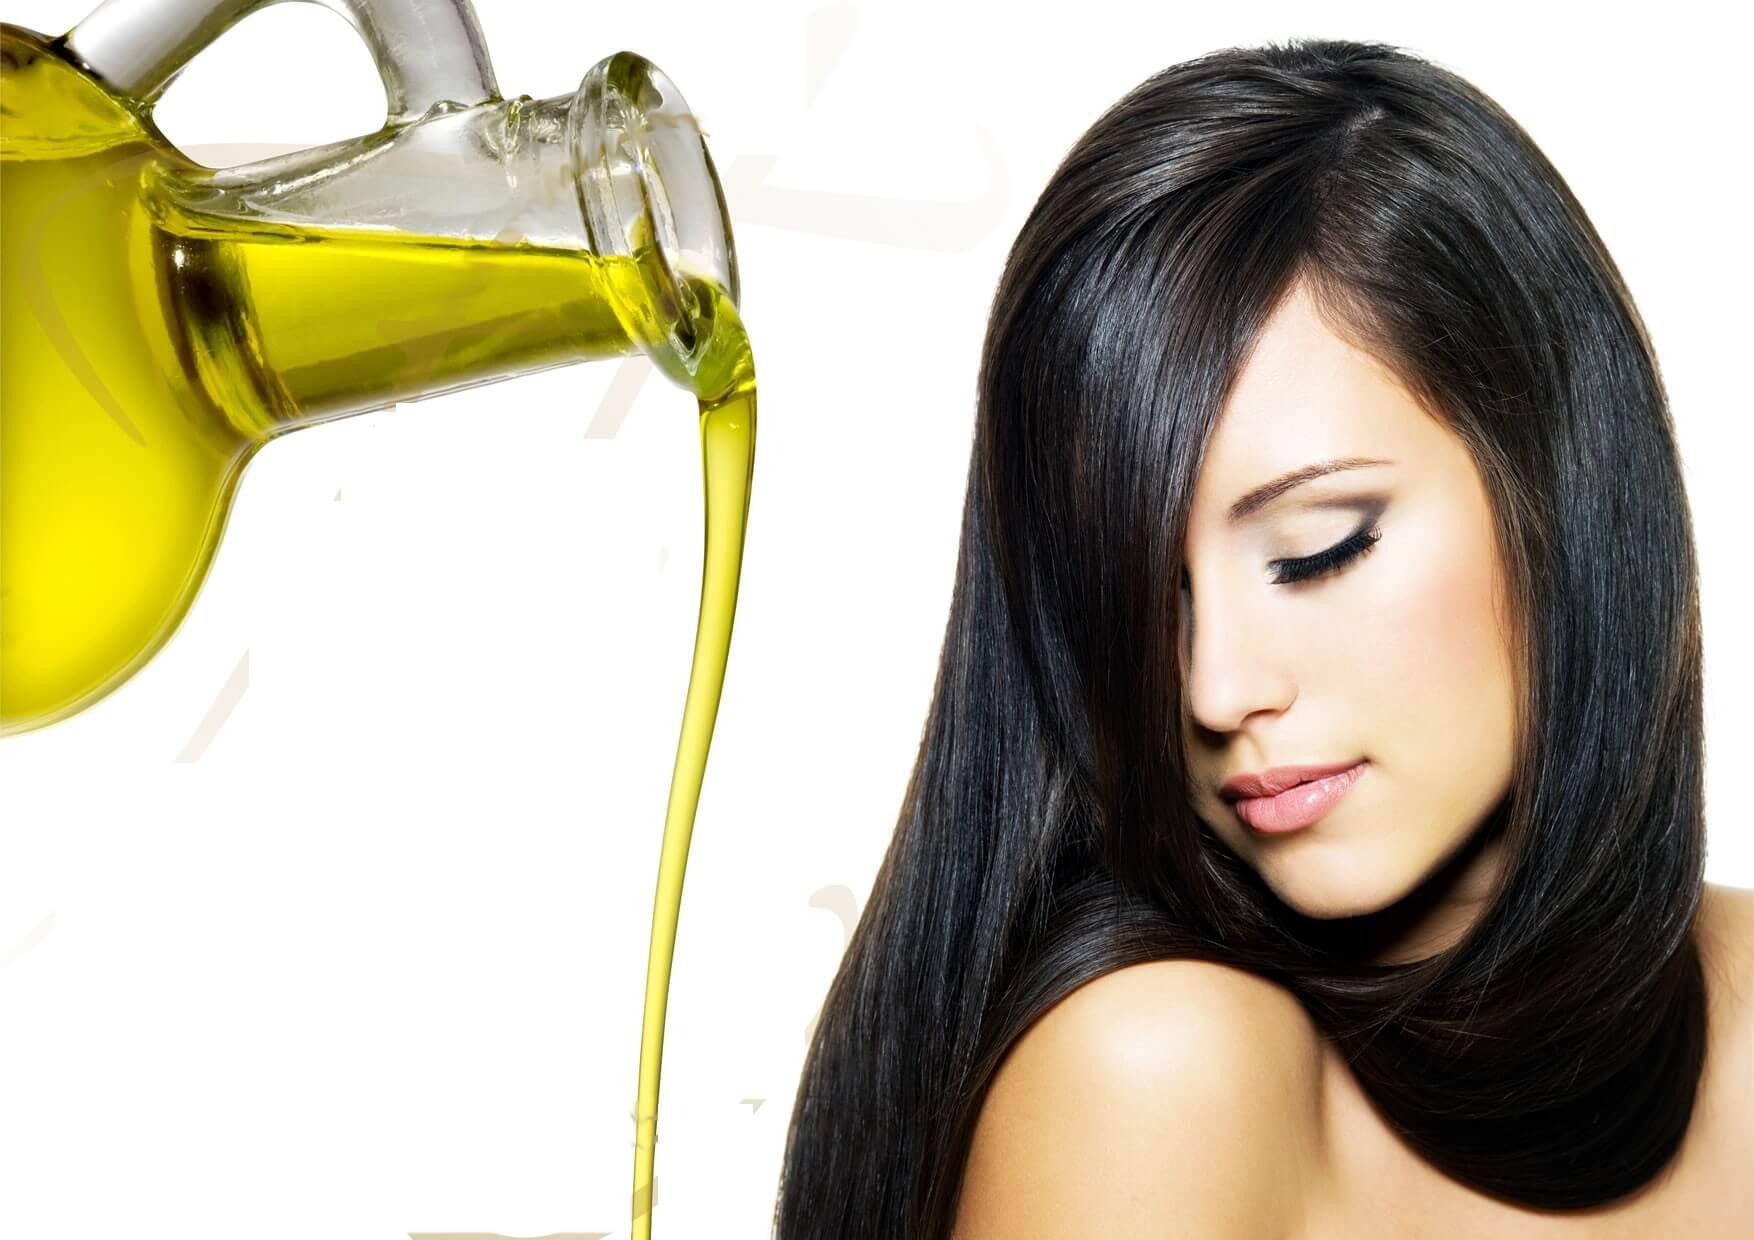 cách chăm sóc tóc -bicicosmetics.vn